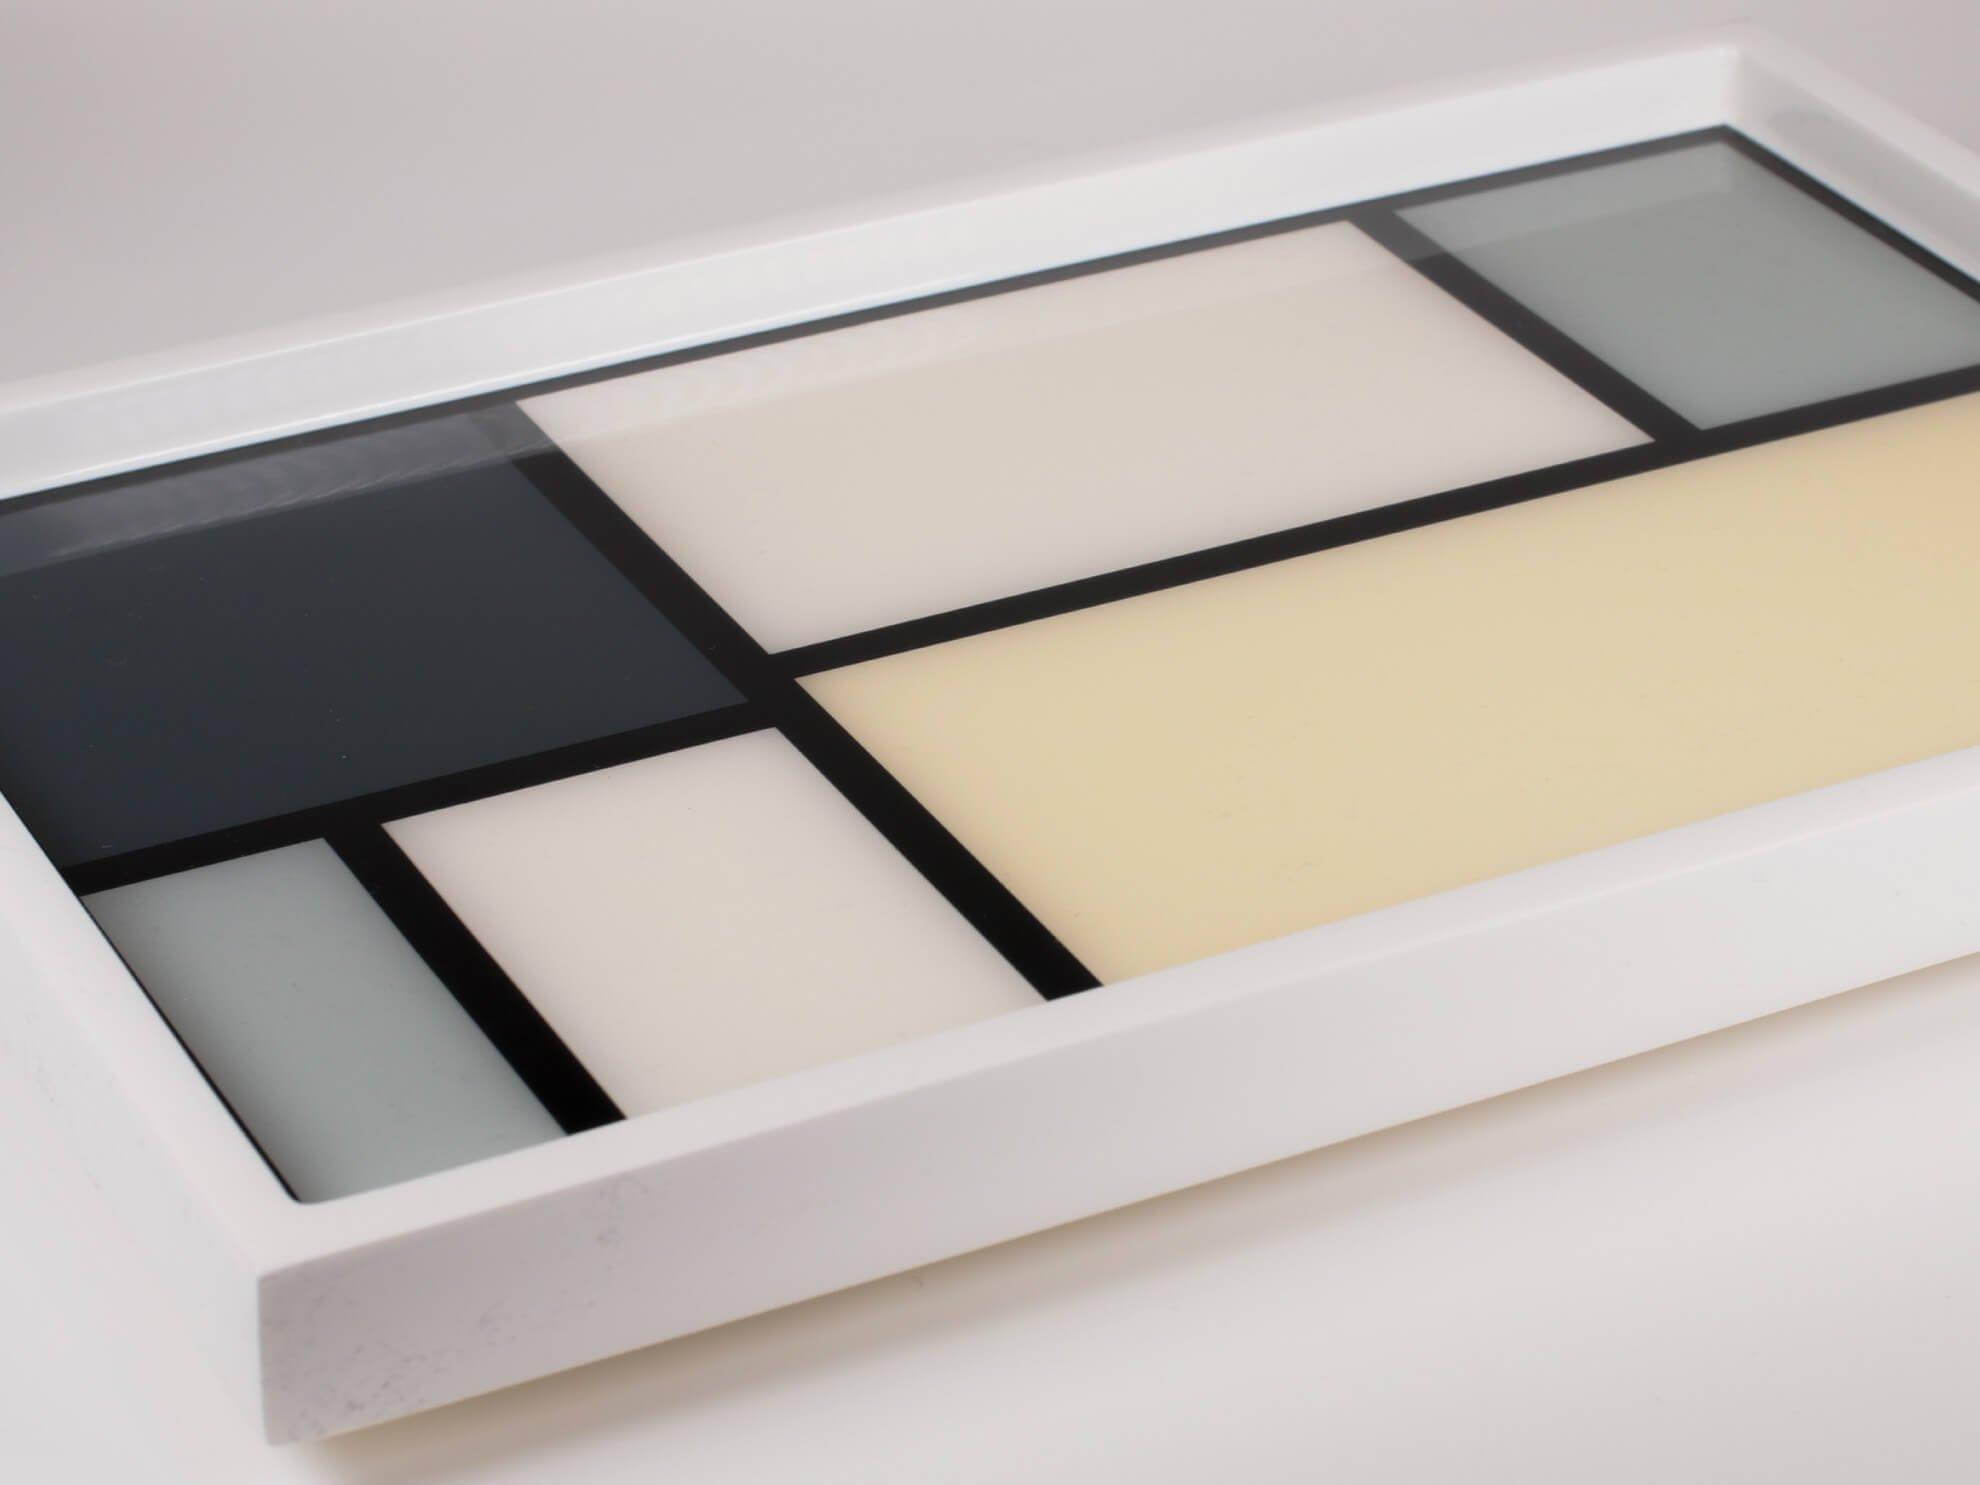 Mondrian Small Tray – Neutral colors